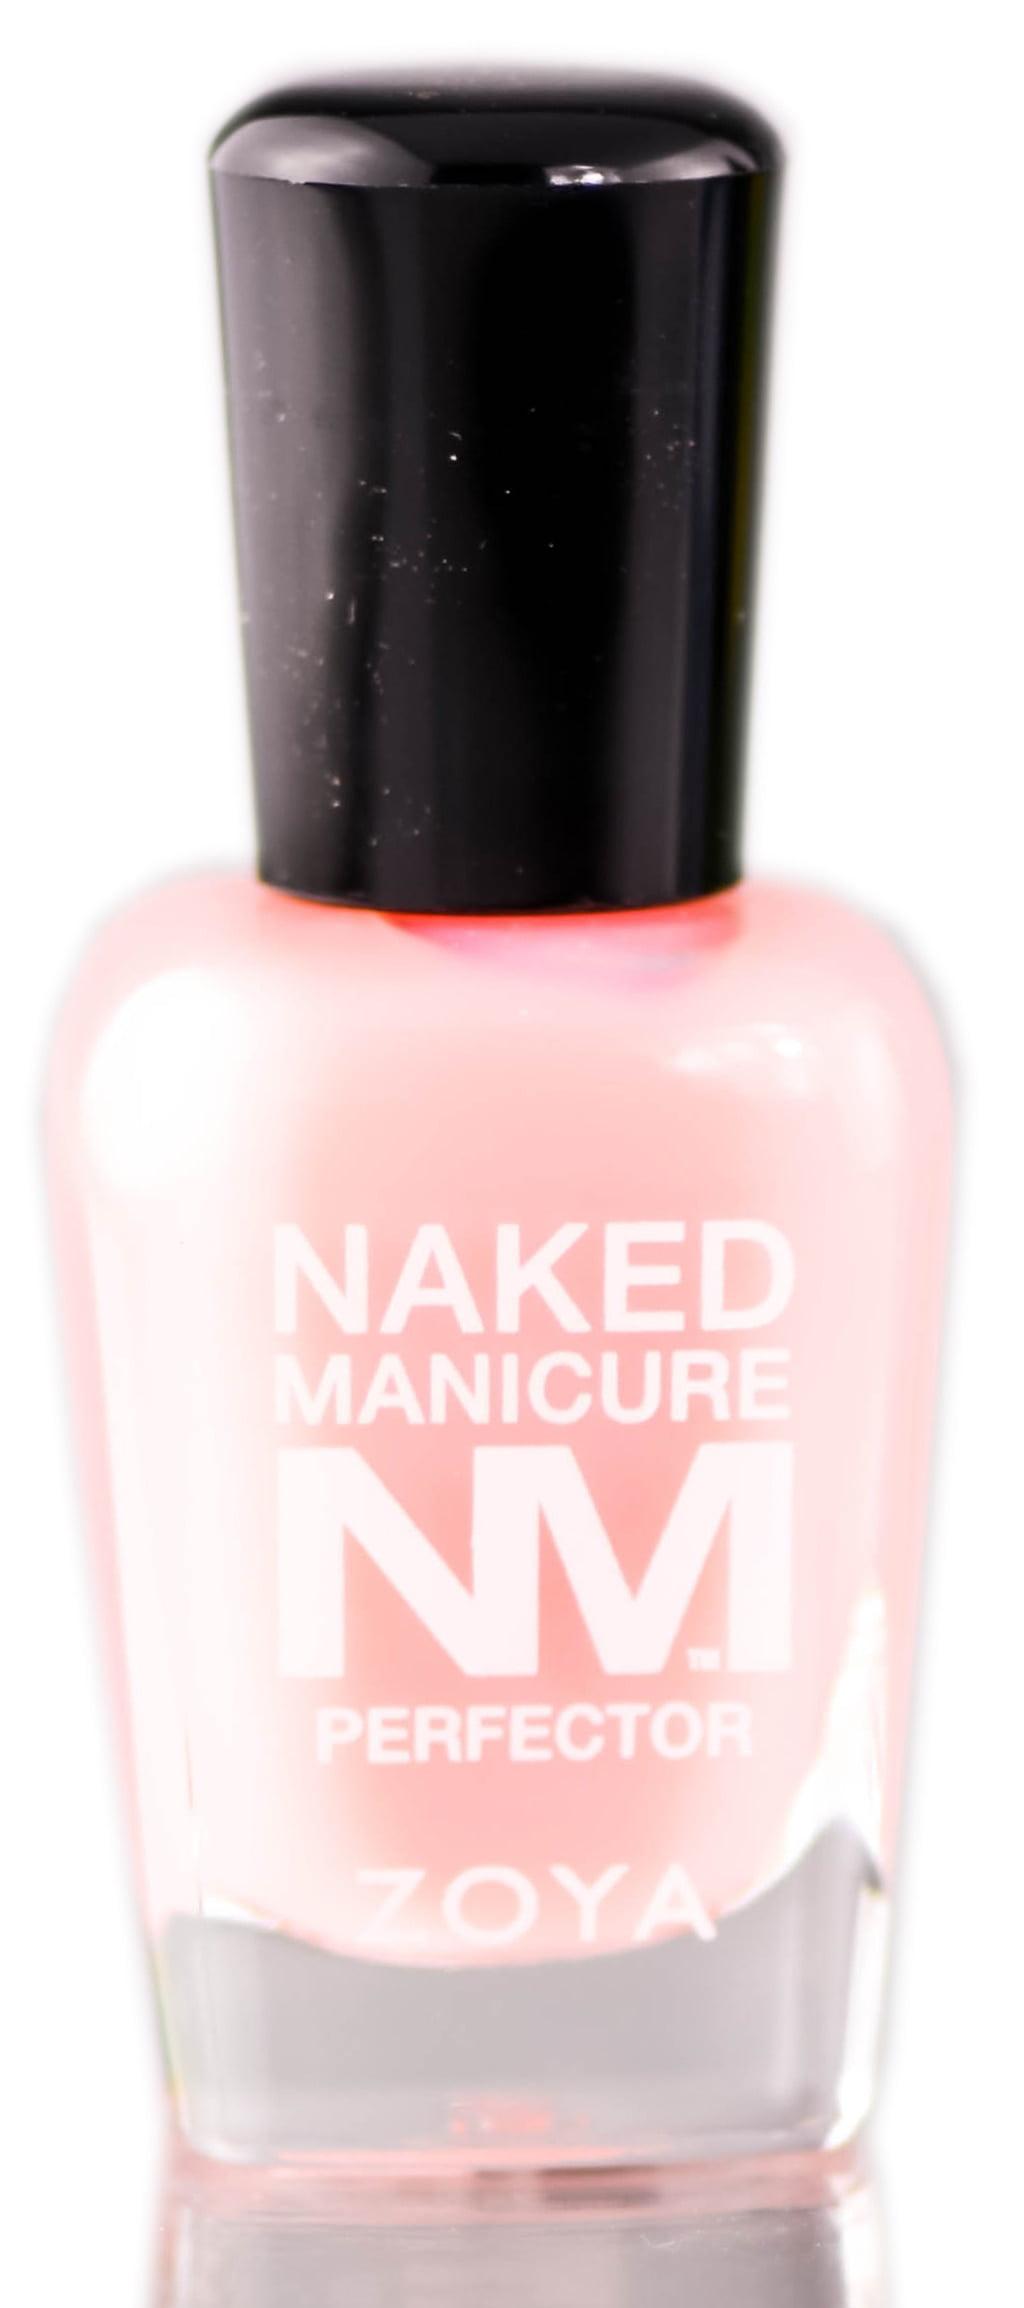 Zoya Naked Manicure Mauve Perfector (0.5 fl. oz. / 15 mL